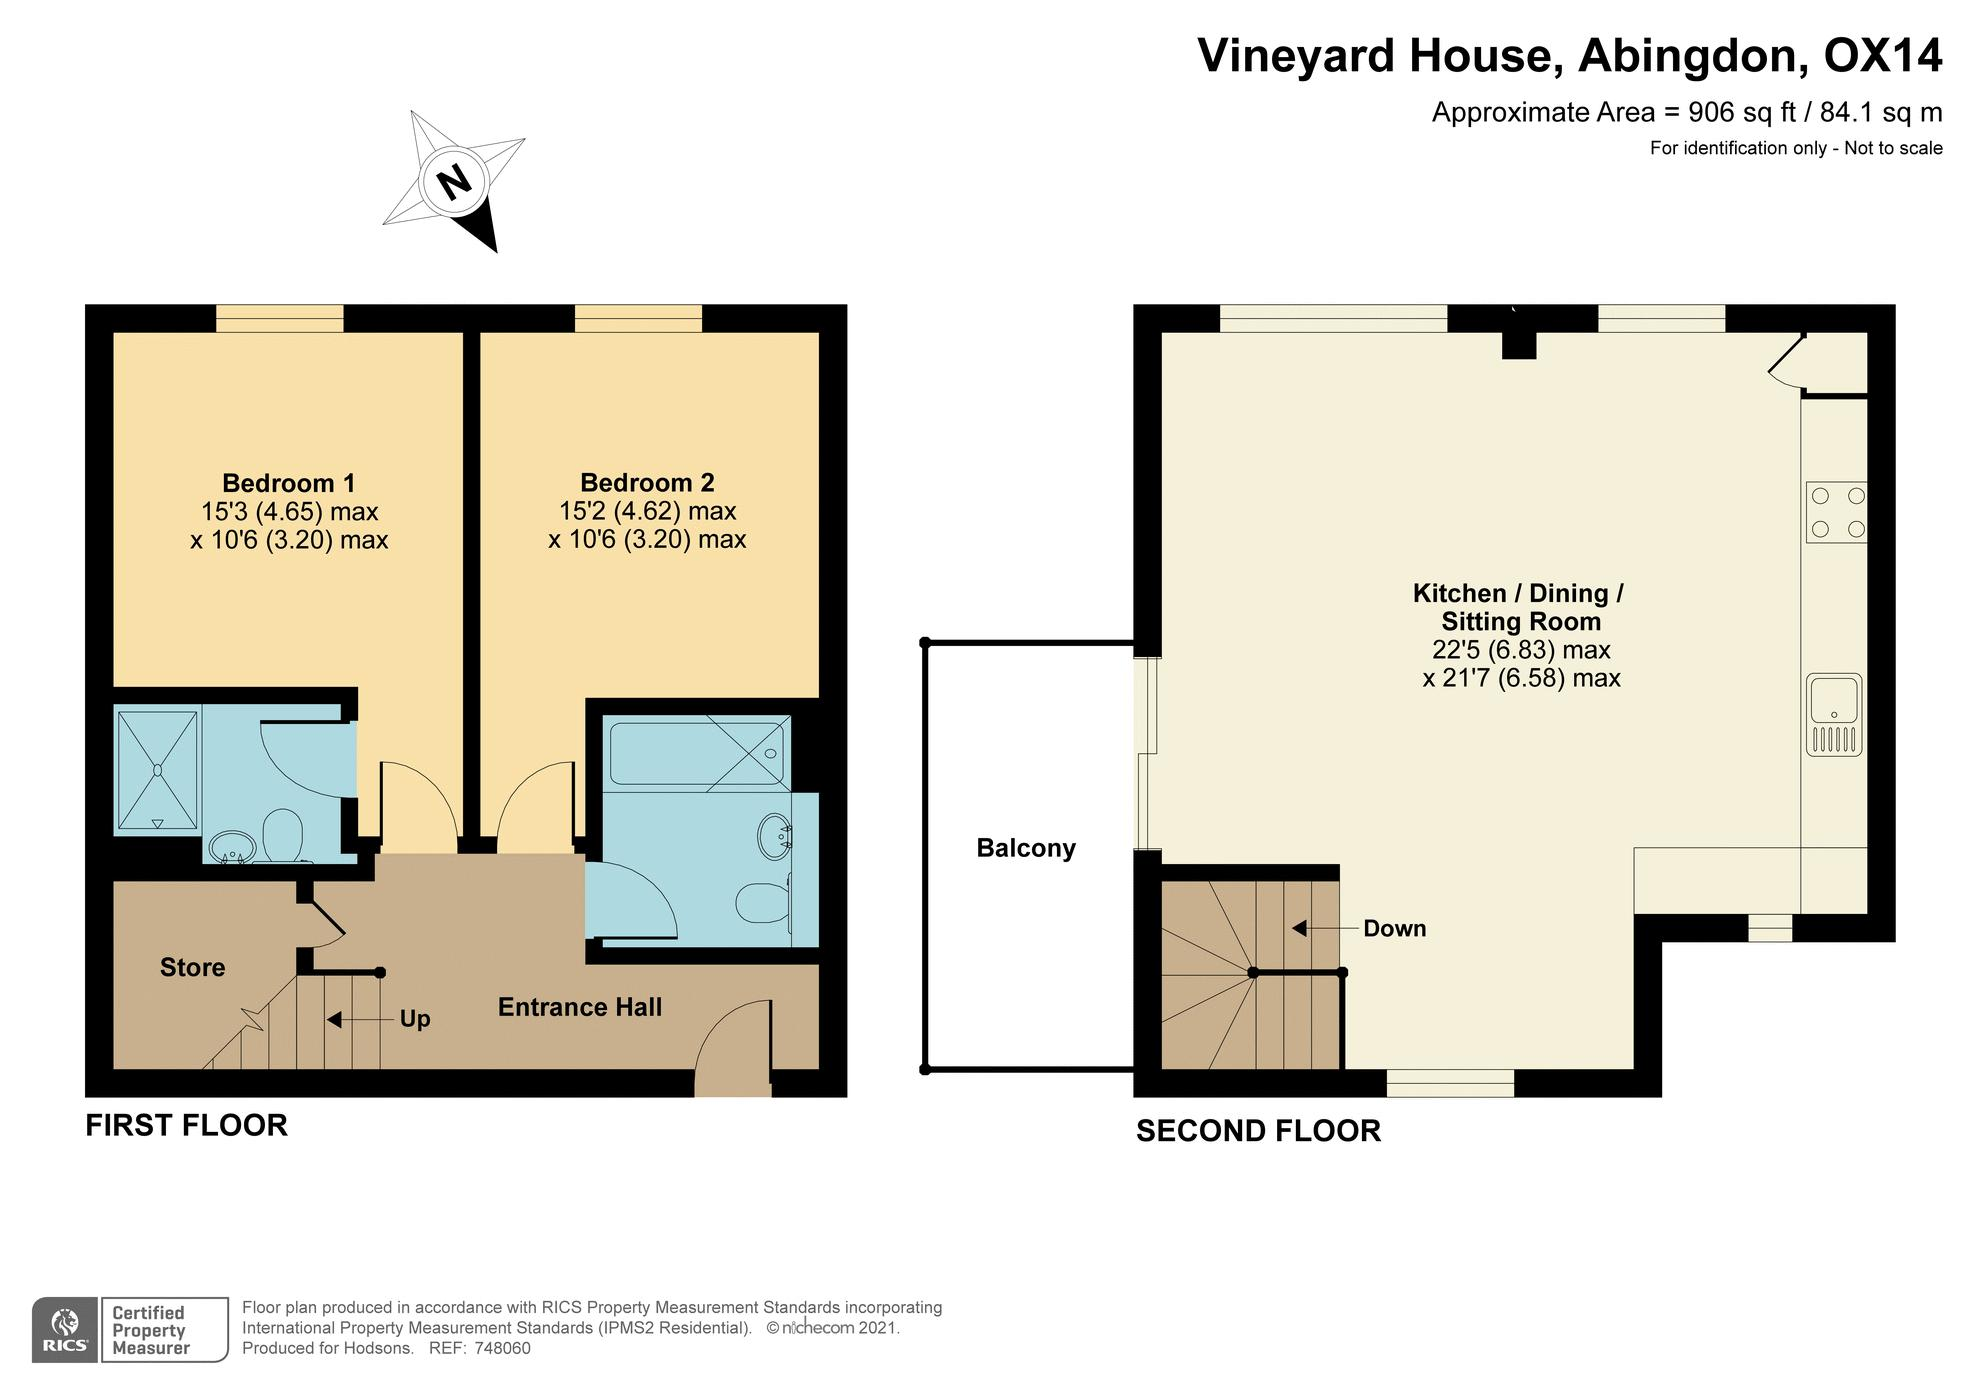 85 Vineyard House